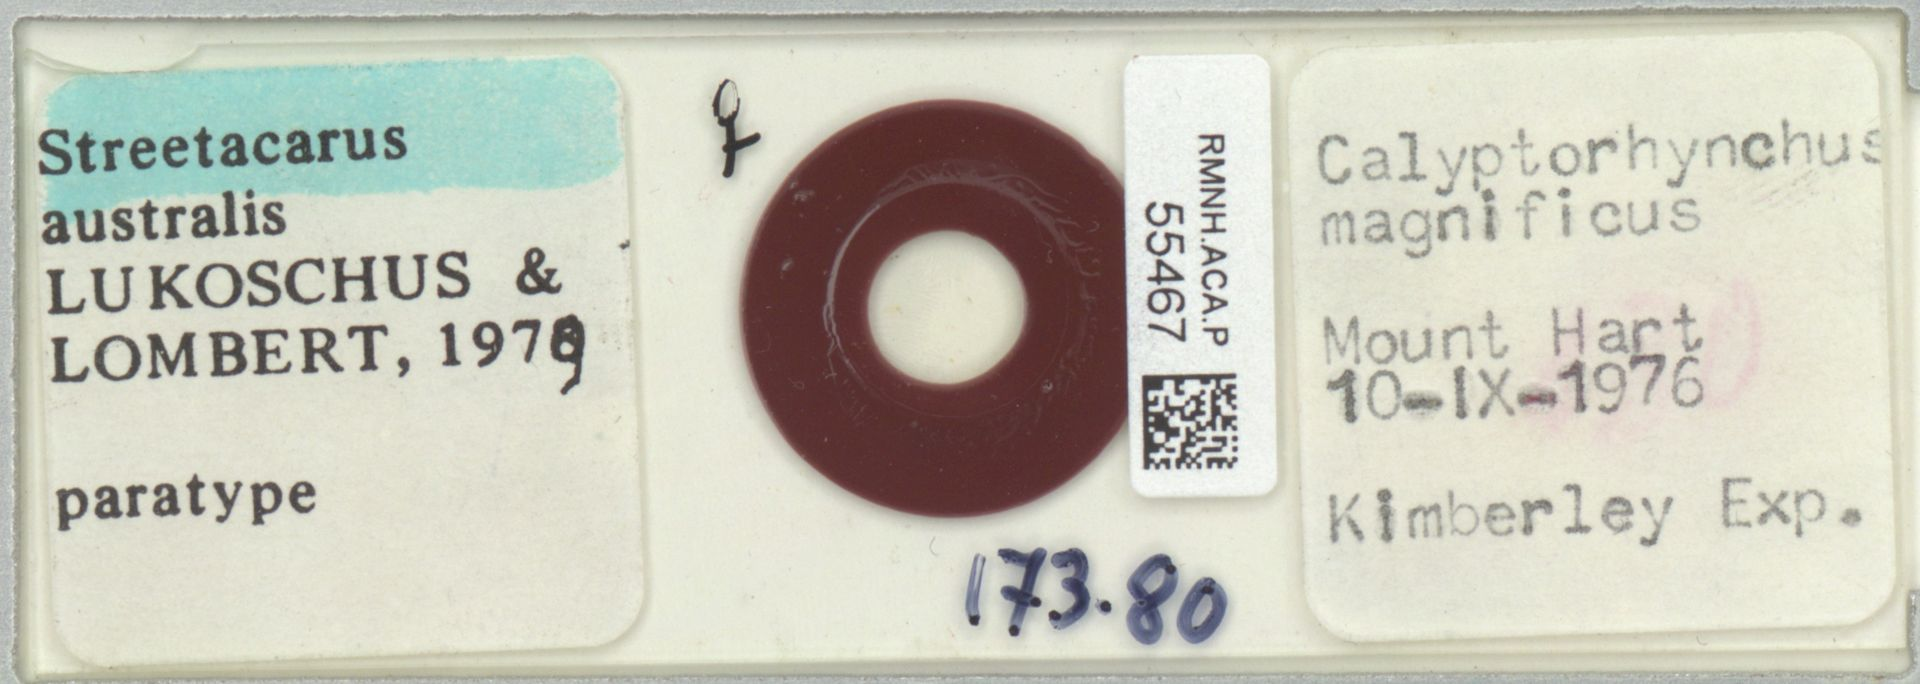 RMNH.ACA.P.55467 | Streetacarus australis lukoschus & Lombert 1979